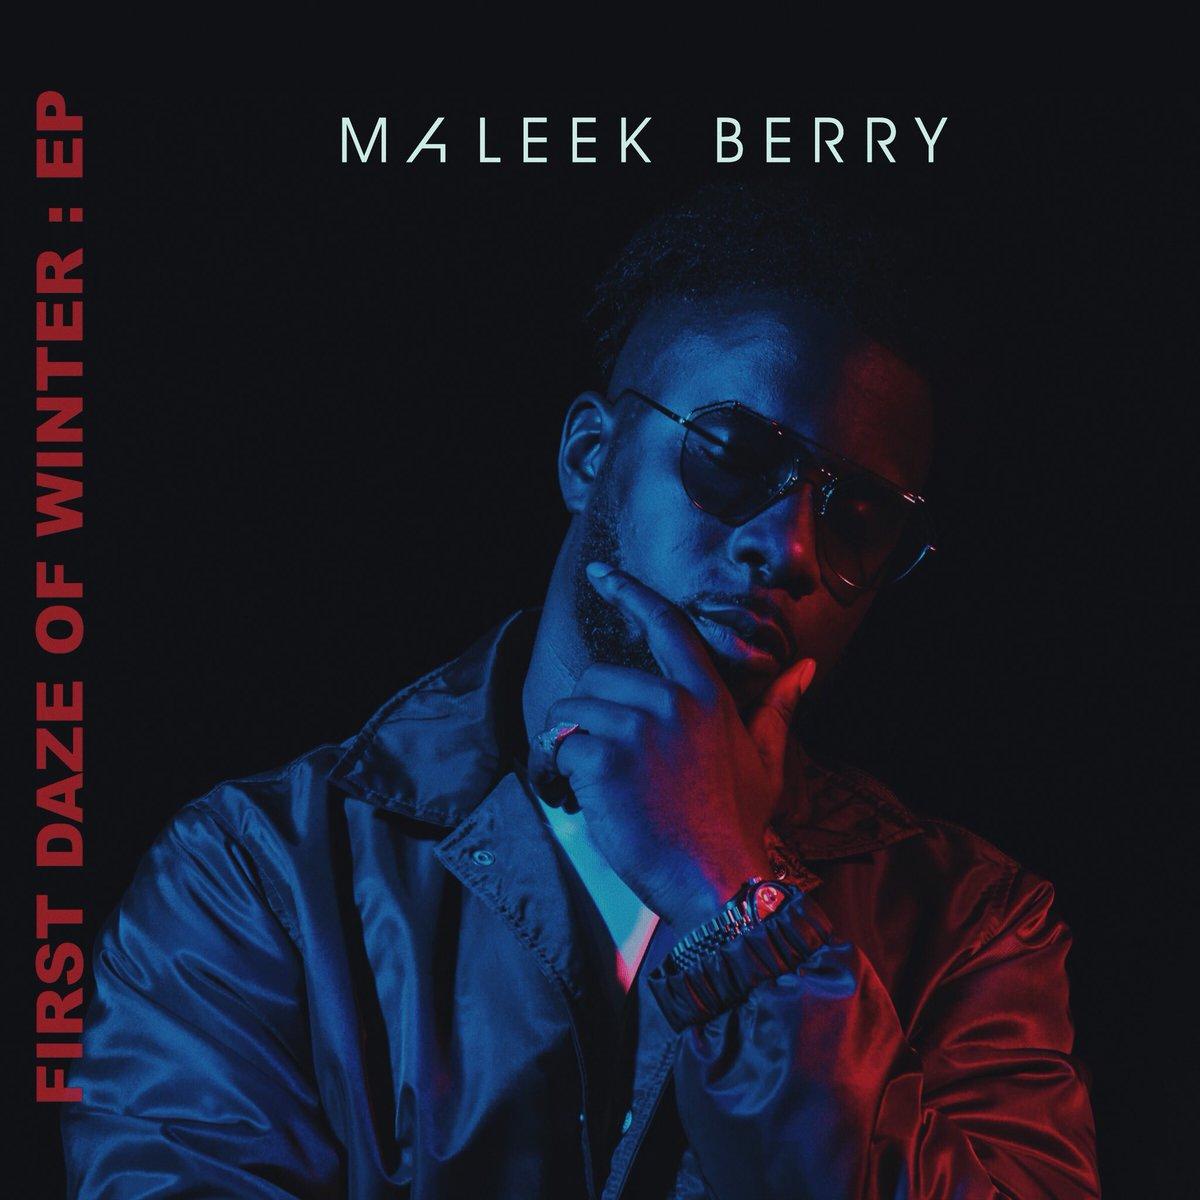 Maleek Berry - Pulling Me Back